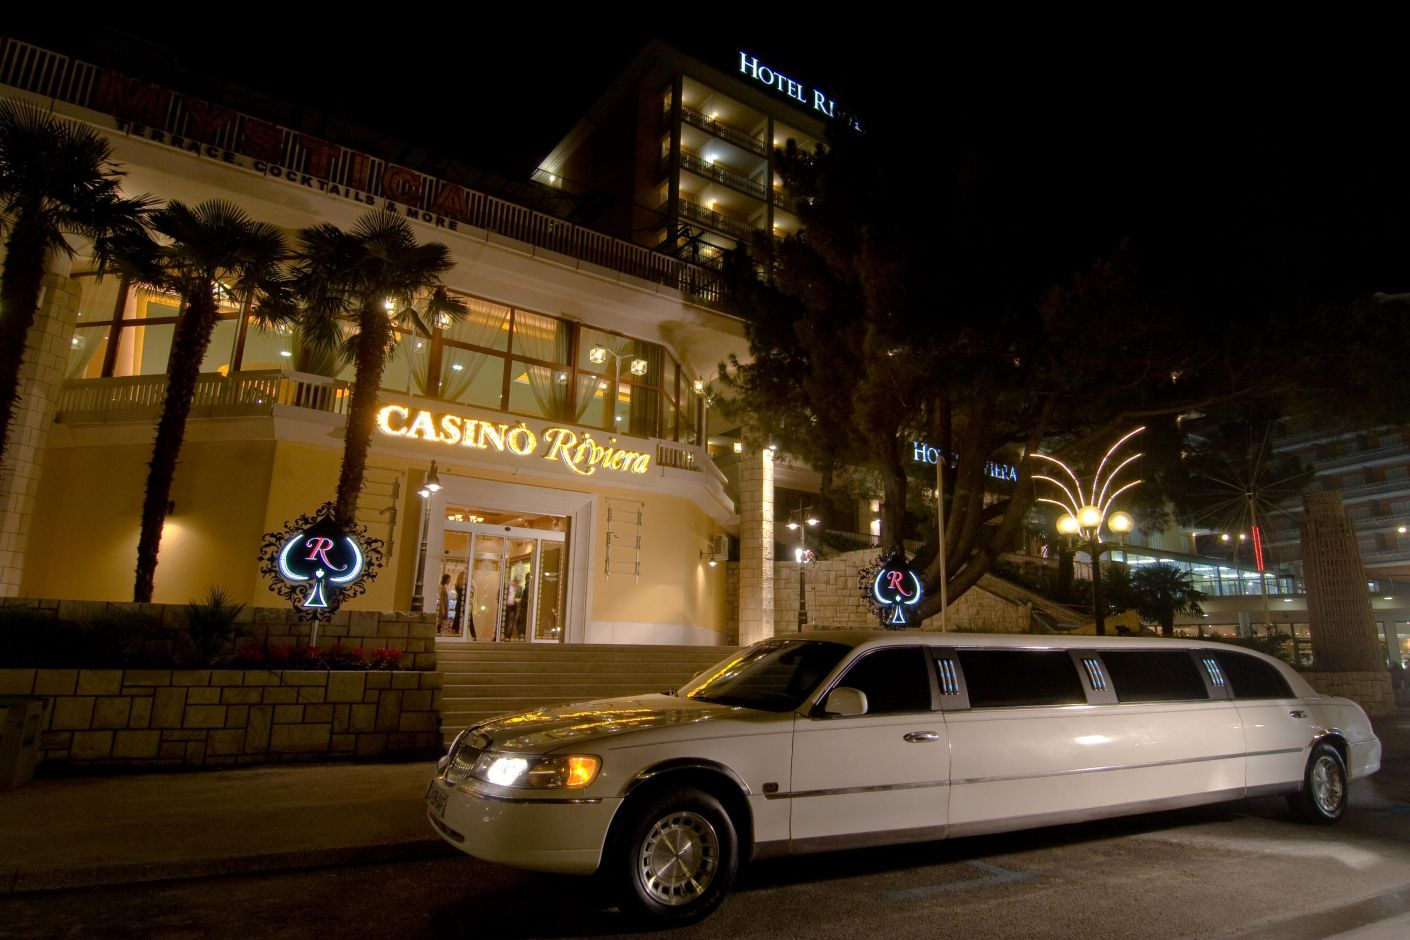 Casino riviera portorose slovenia